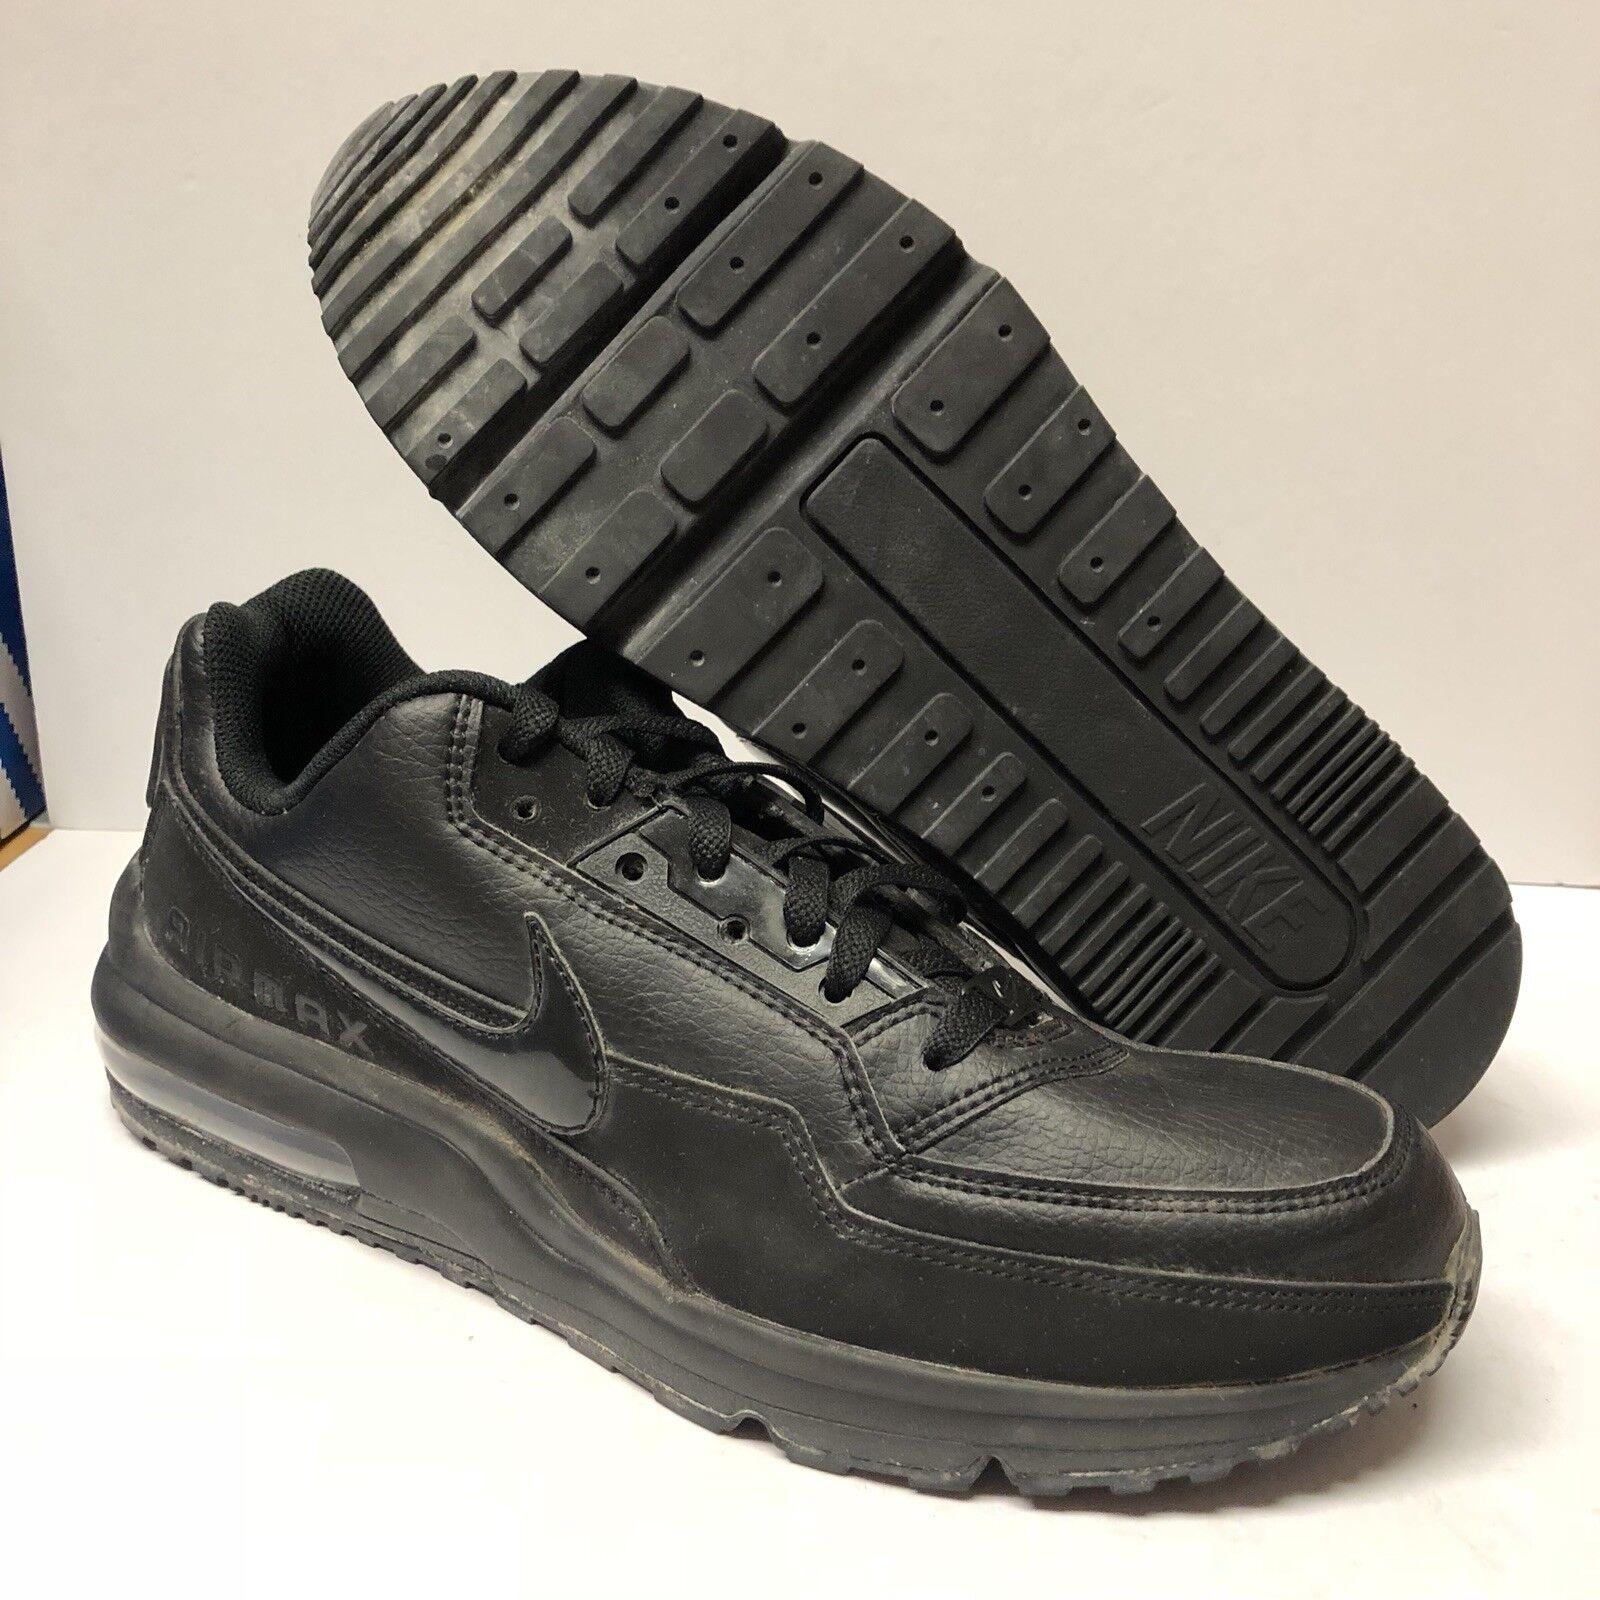 Nike Air Max LTD 3 Running shoes Black Black Size 10.5 Unisex No Box